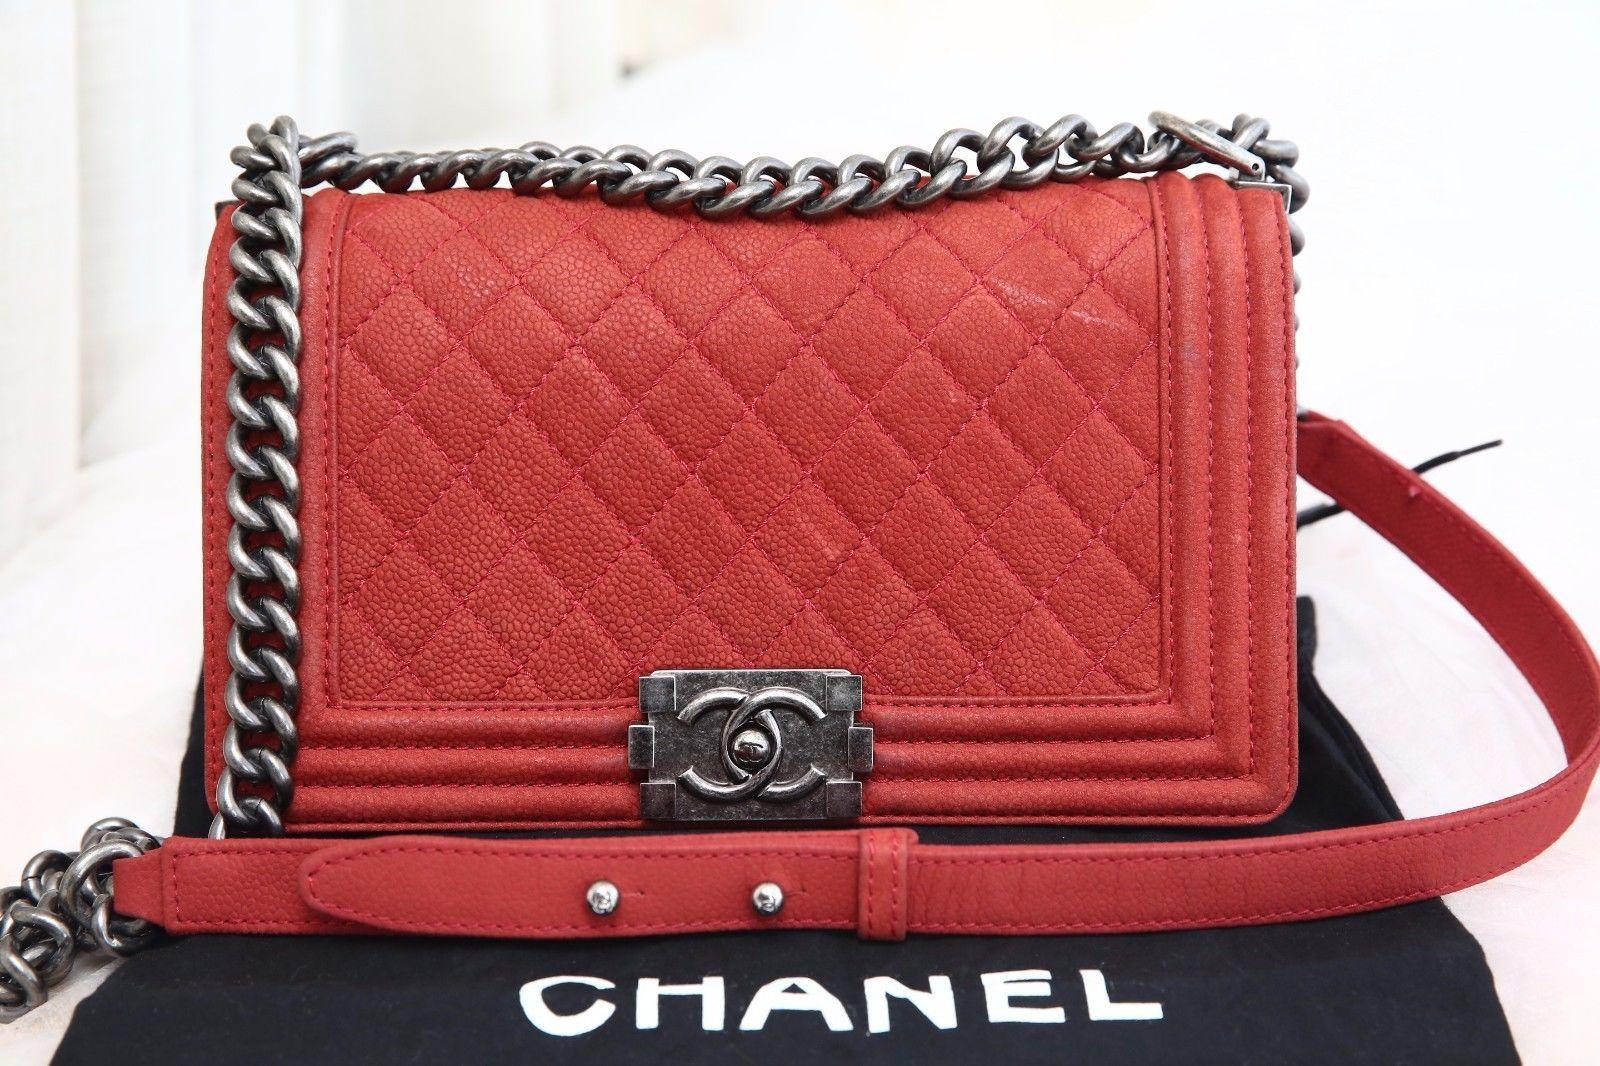 3ce0fbcdfe6d VERIFIED Authentic Rare Calfskin Chanel Matte Caviar Red Medium Le Boy Flap  Bag $2699.0